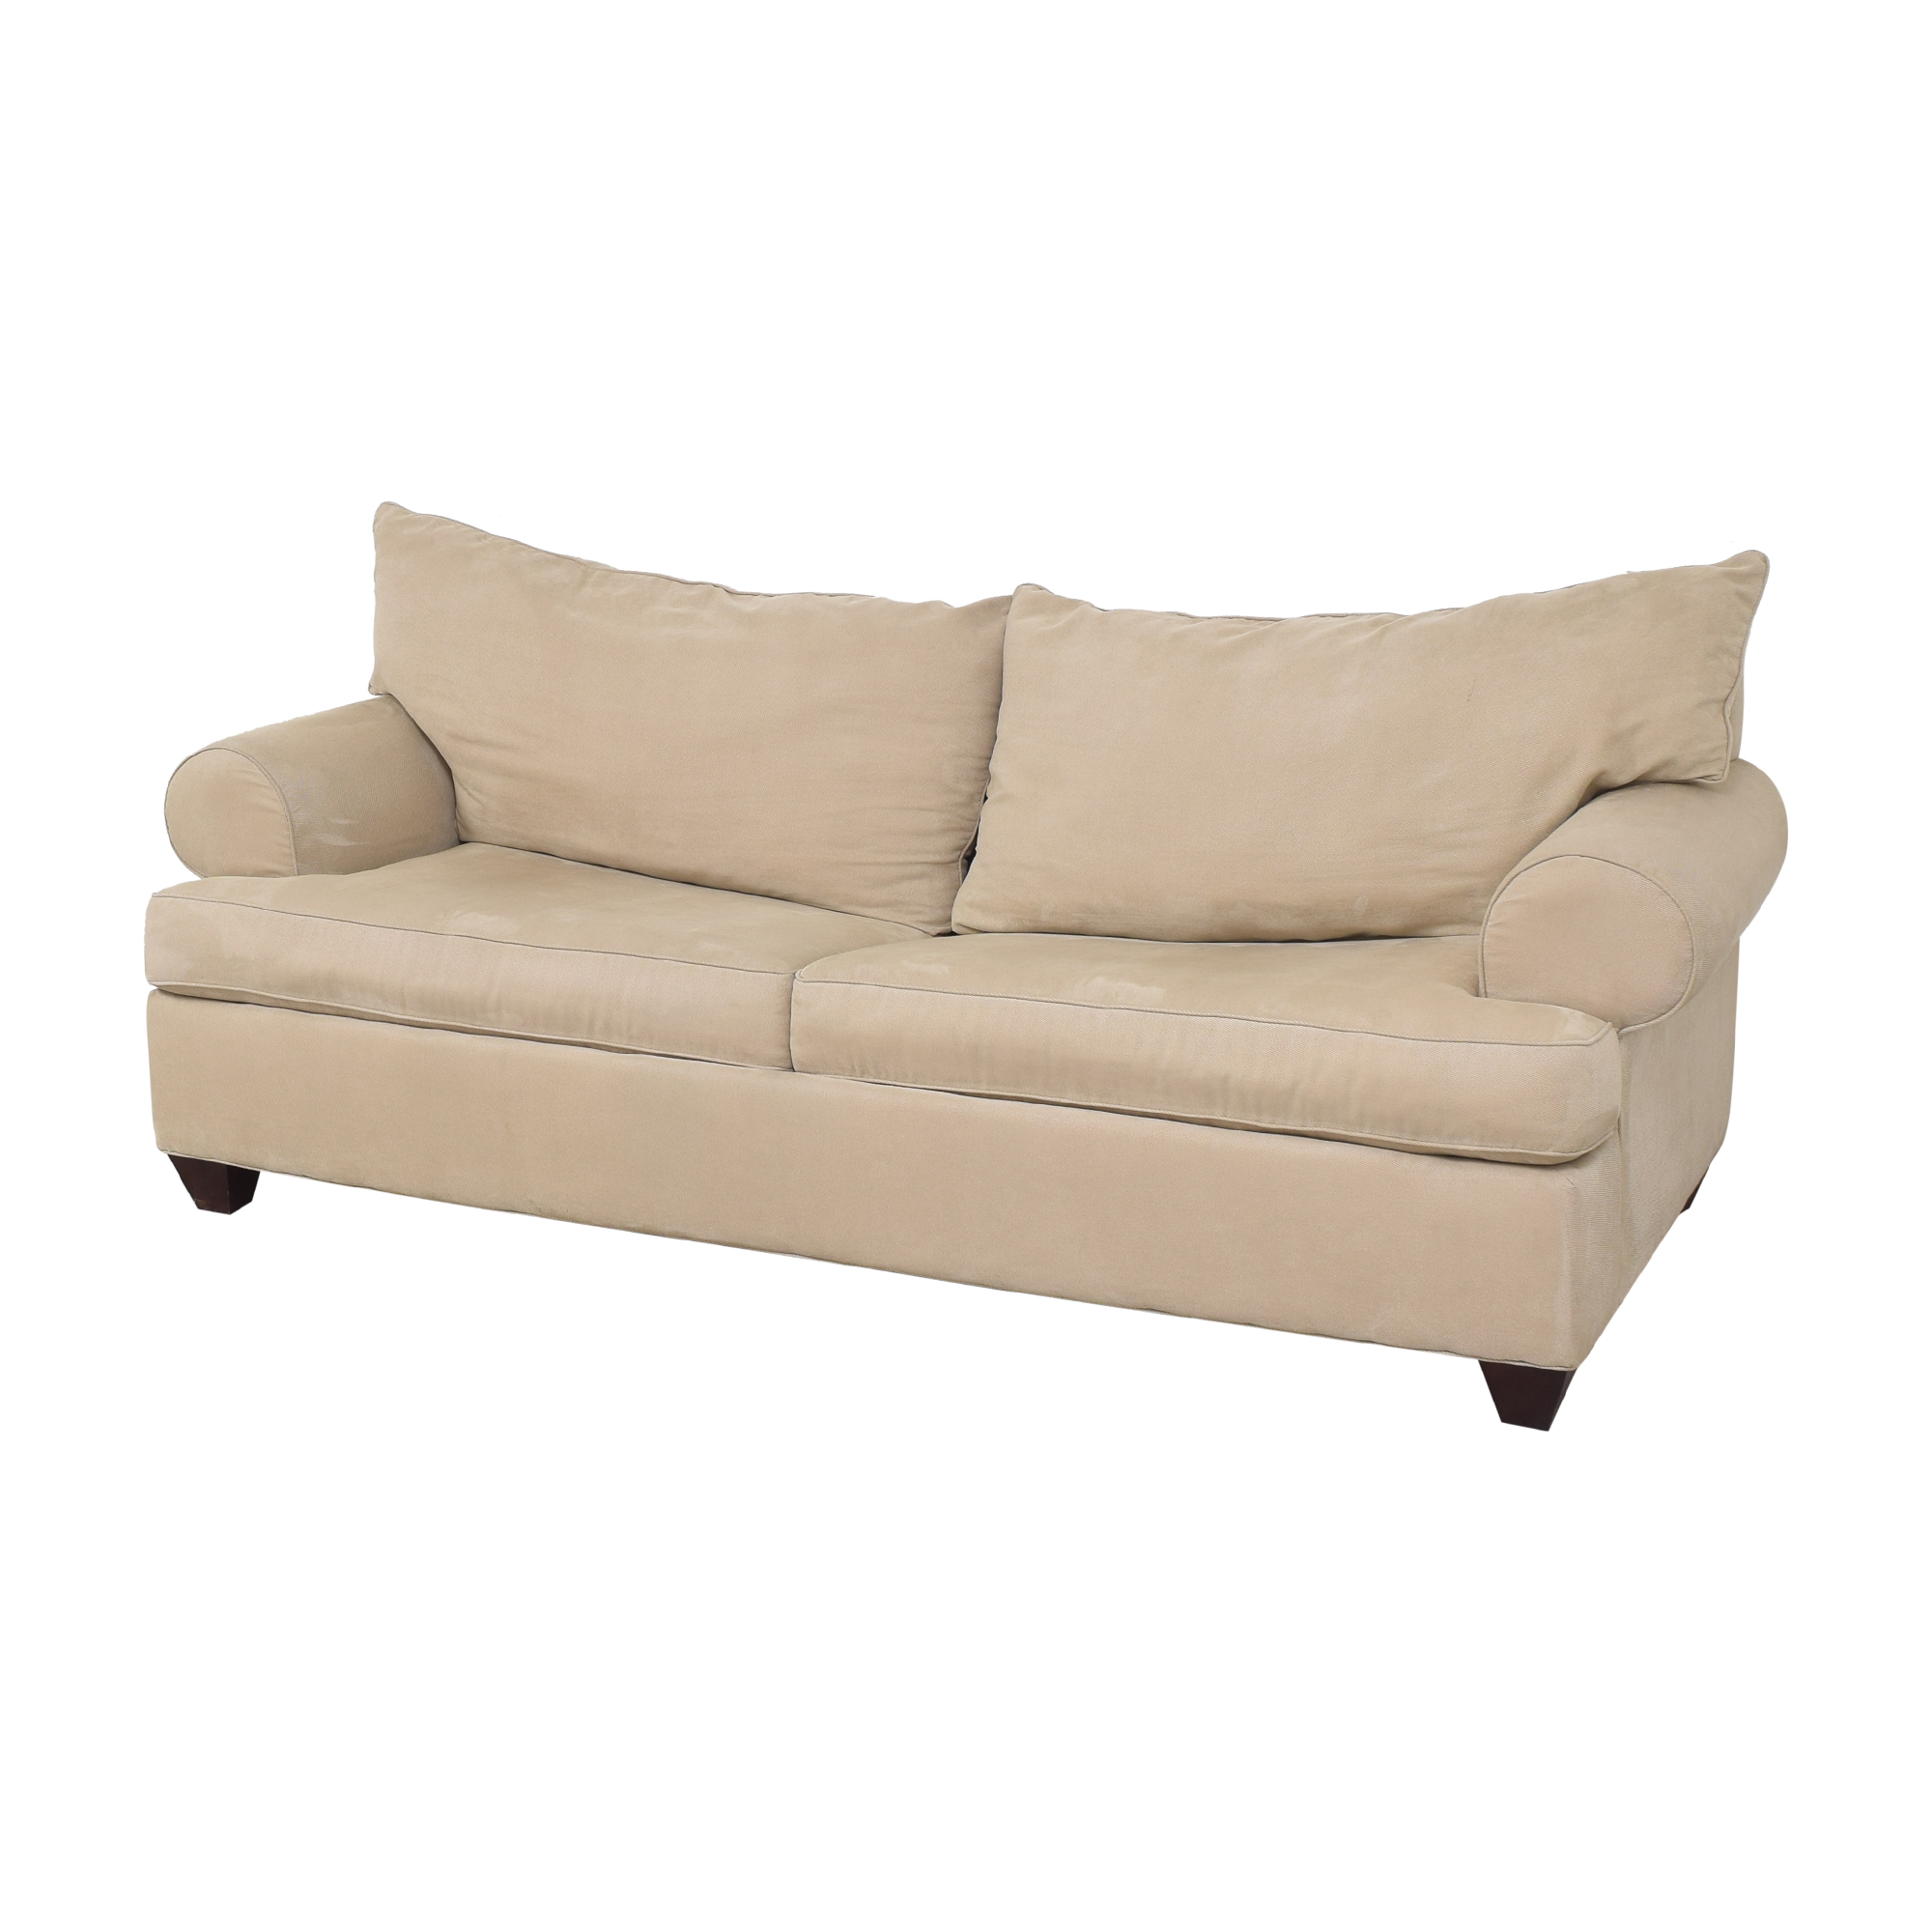 Raymour & Flanigan Raymour & Flanigan Two Cushion Sleeper Sofa nyc